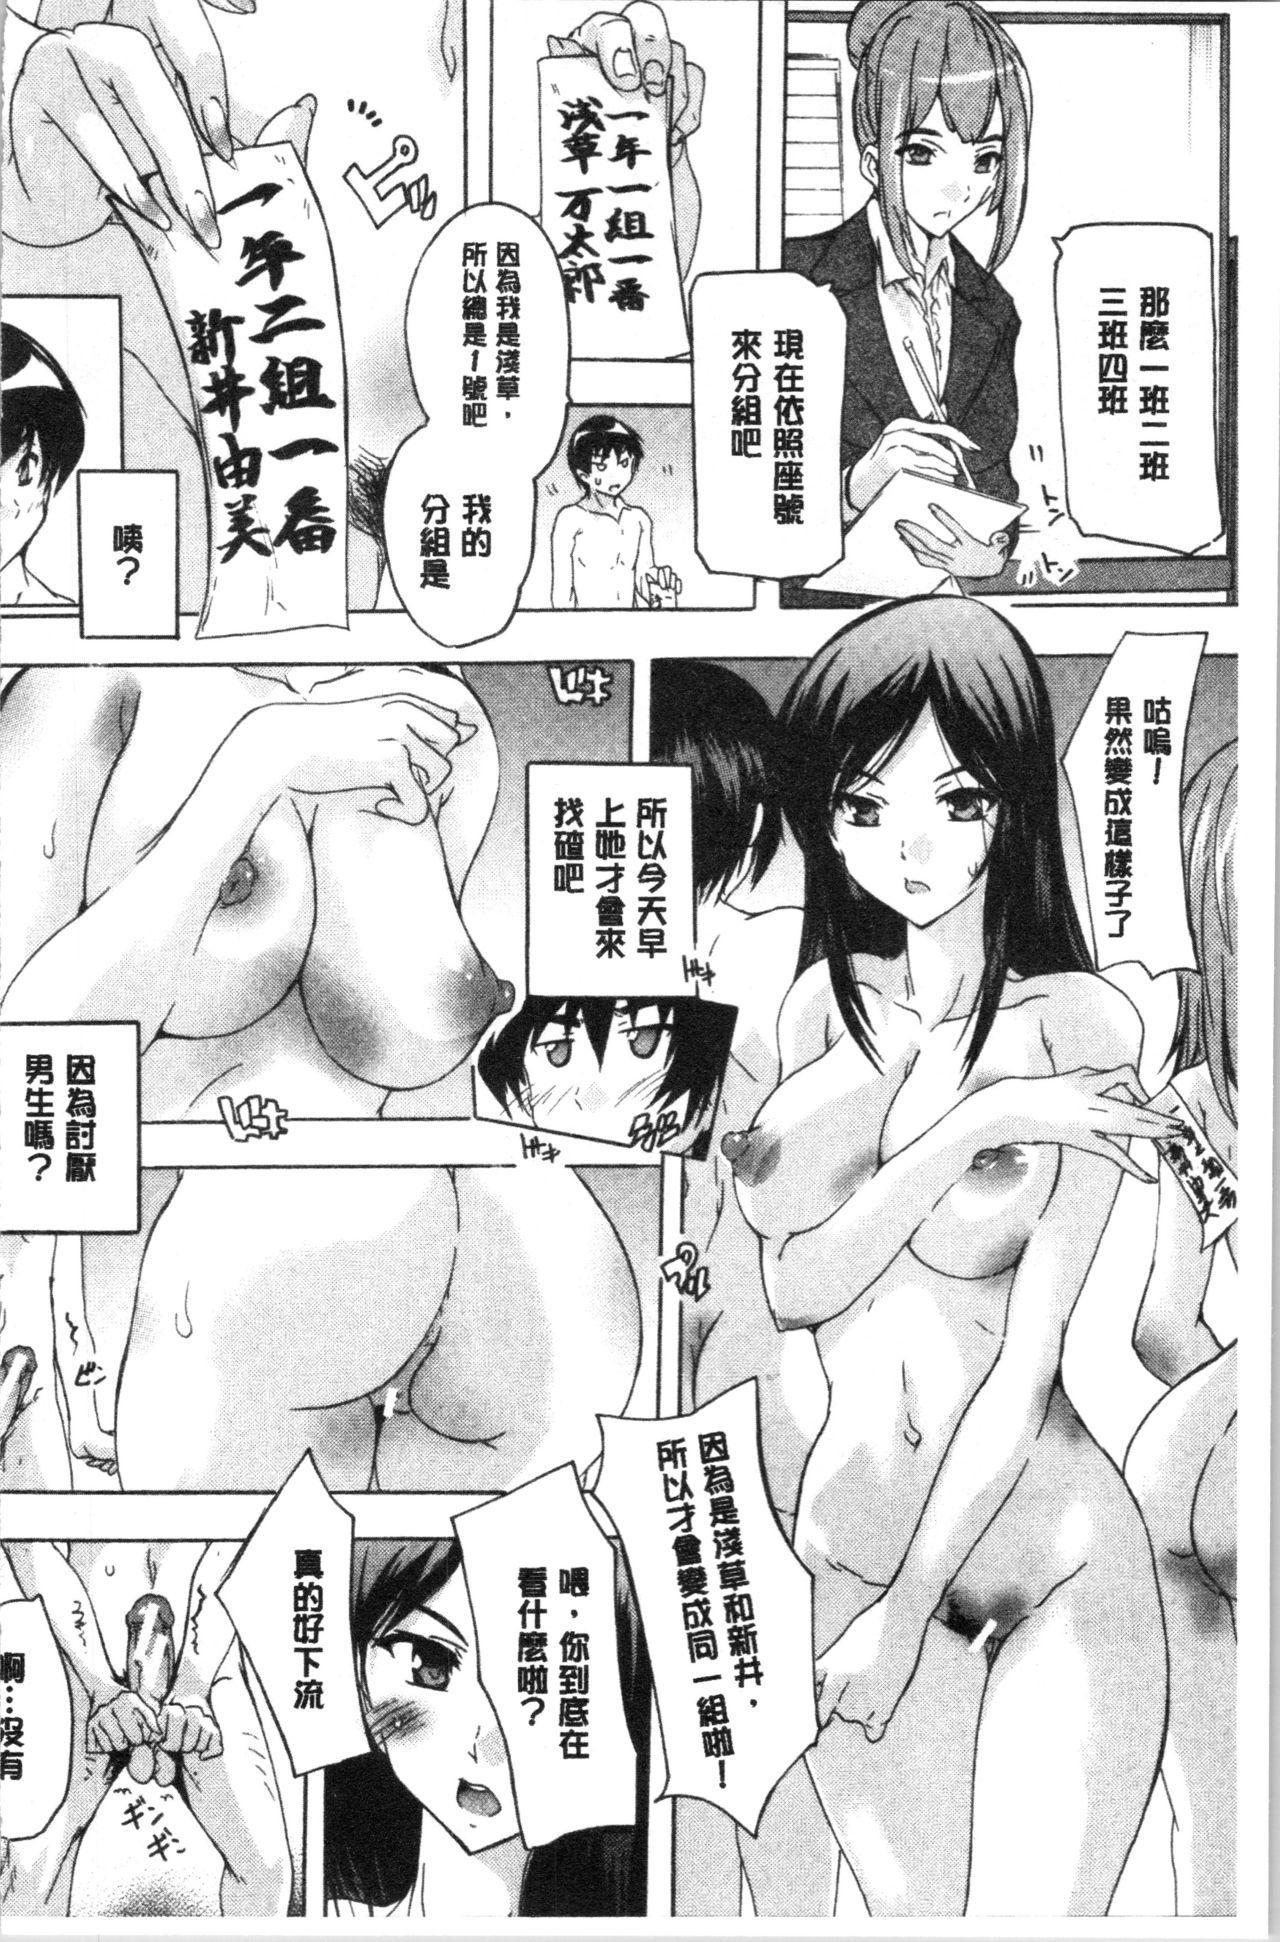 [Natsuka Q-Ya] Hisshuu!! Sex-bu - SEIGI-DO The Ultimate Martial Arts   必修!!性愛淫交部 [Chinese] 42